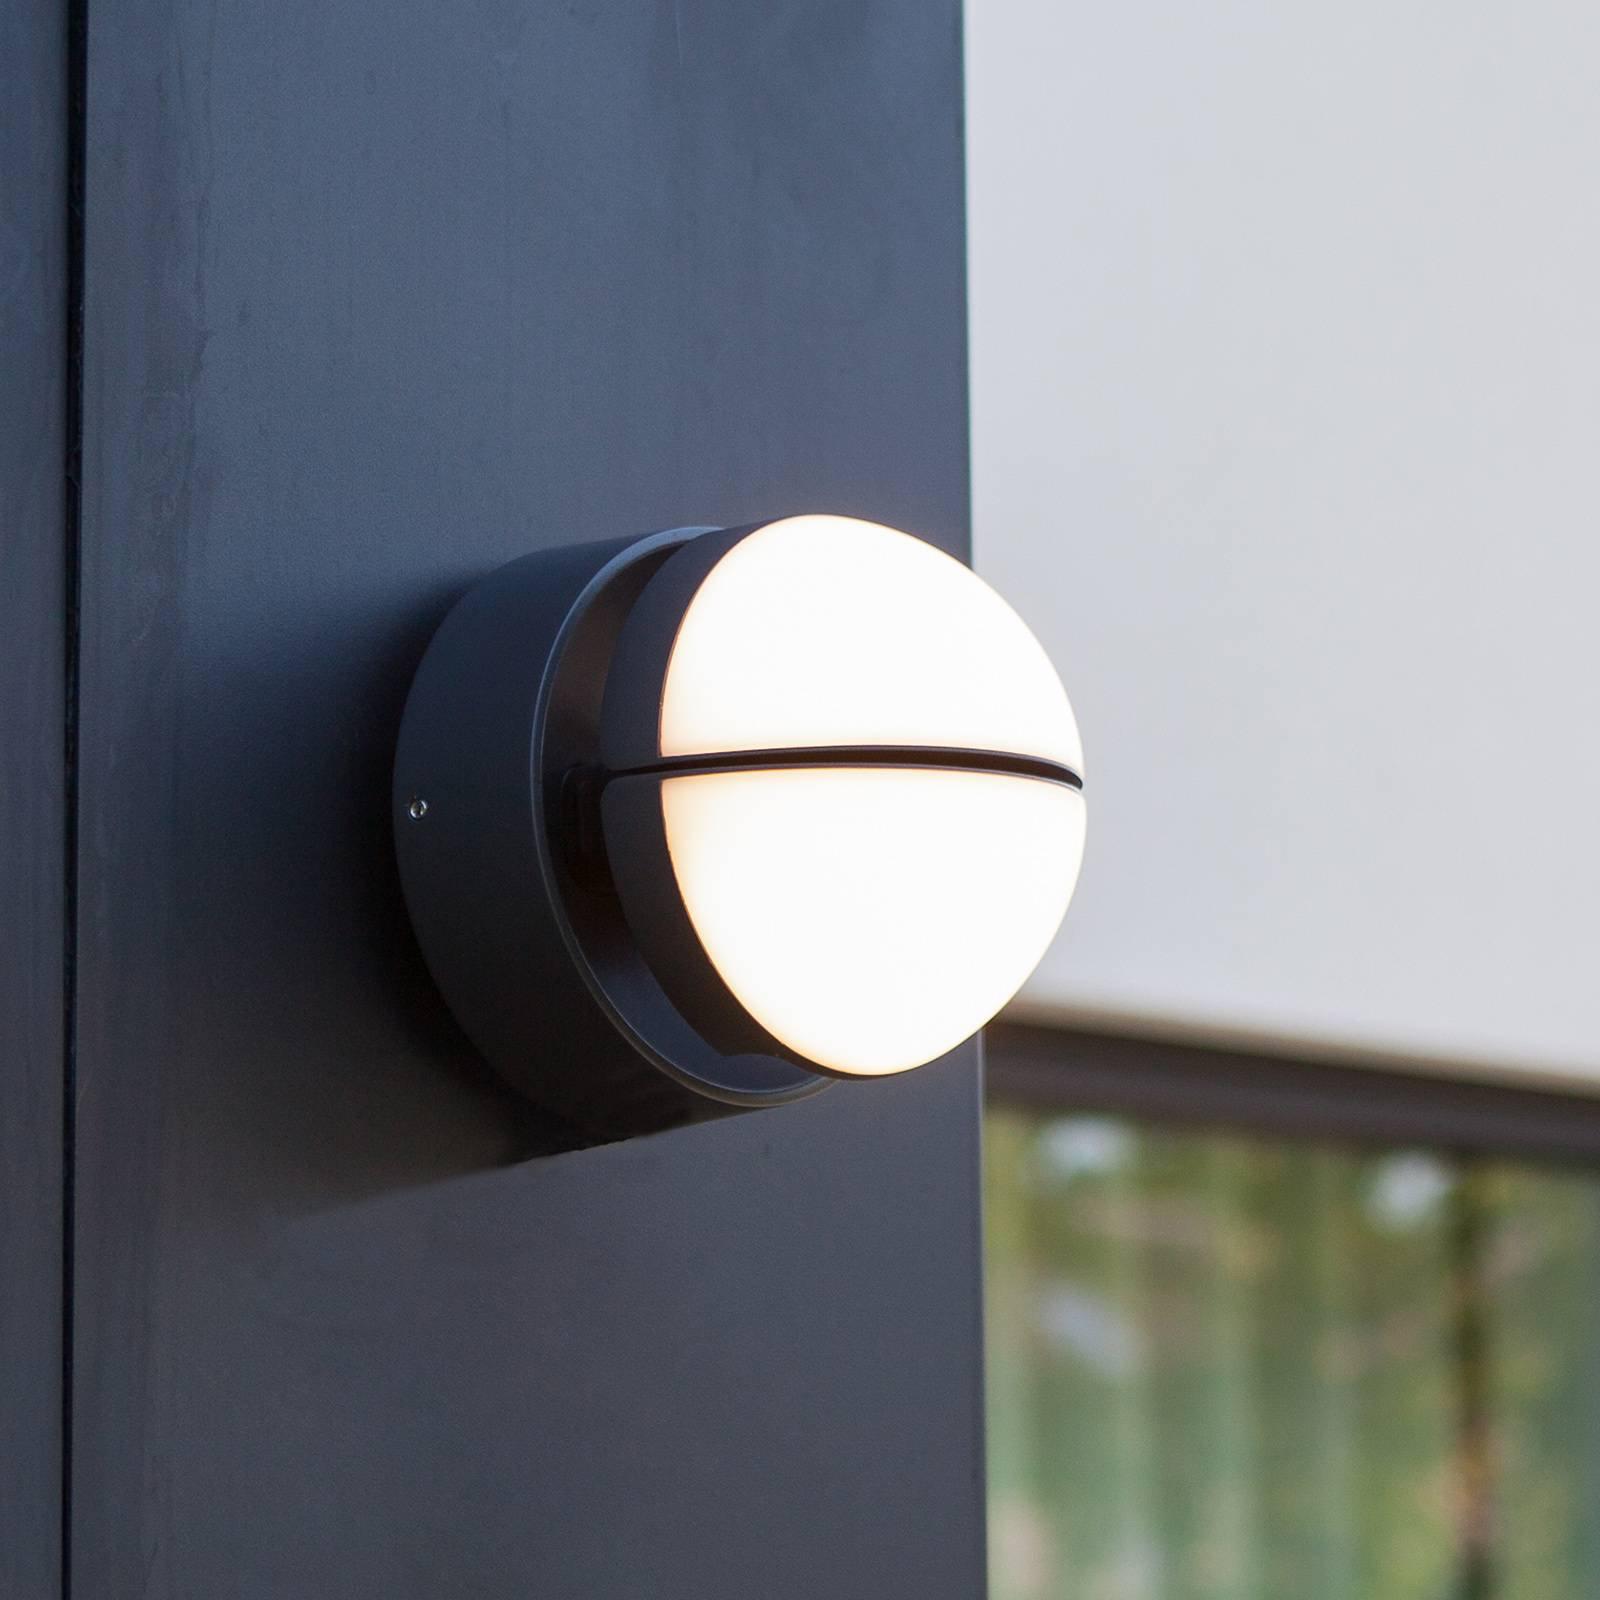 LED-vegglampe Eklips, 2 lyskilder